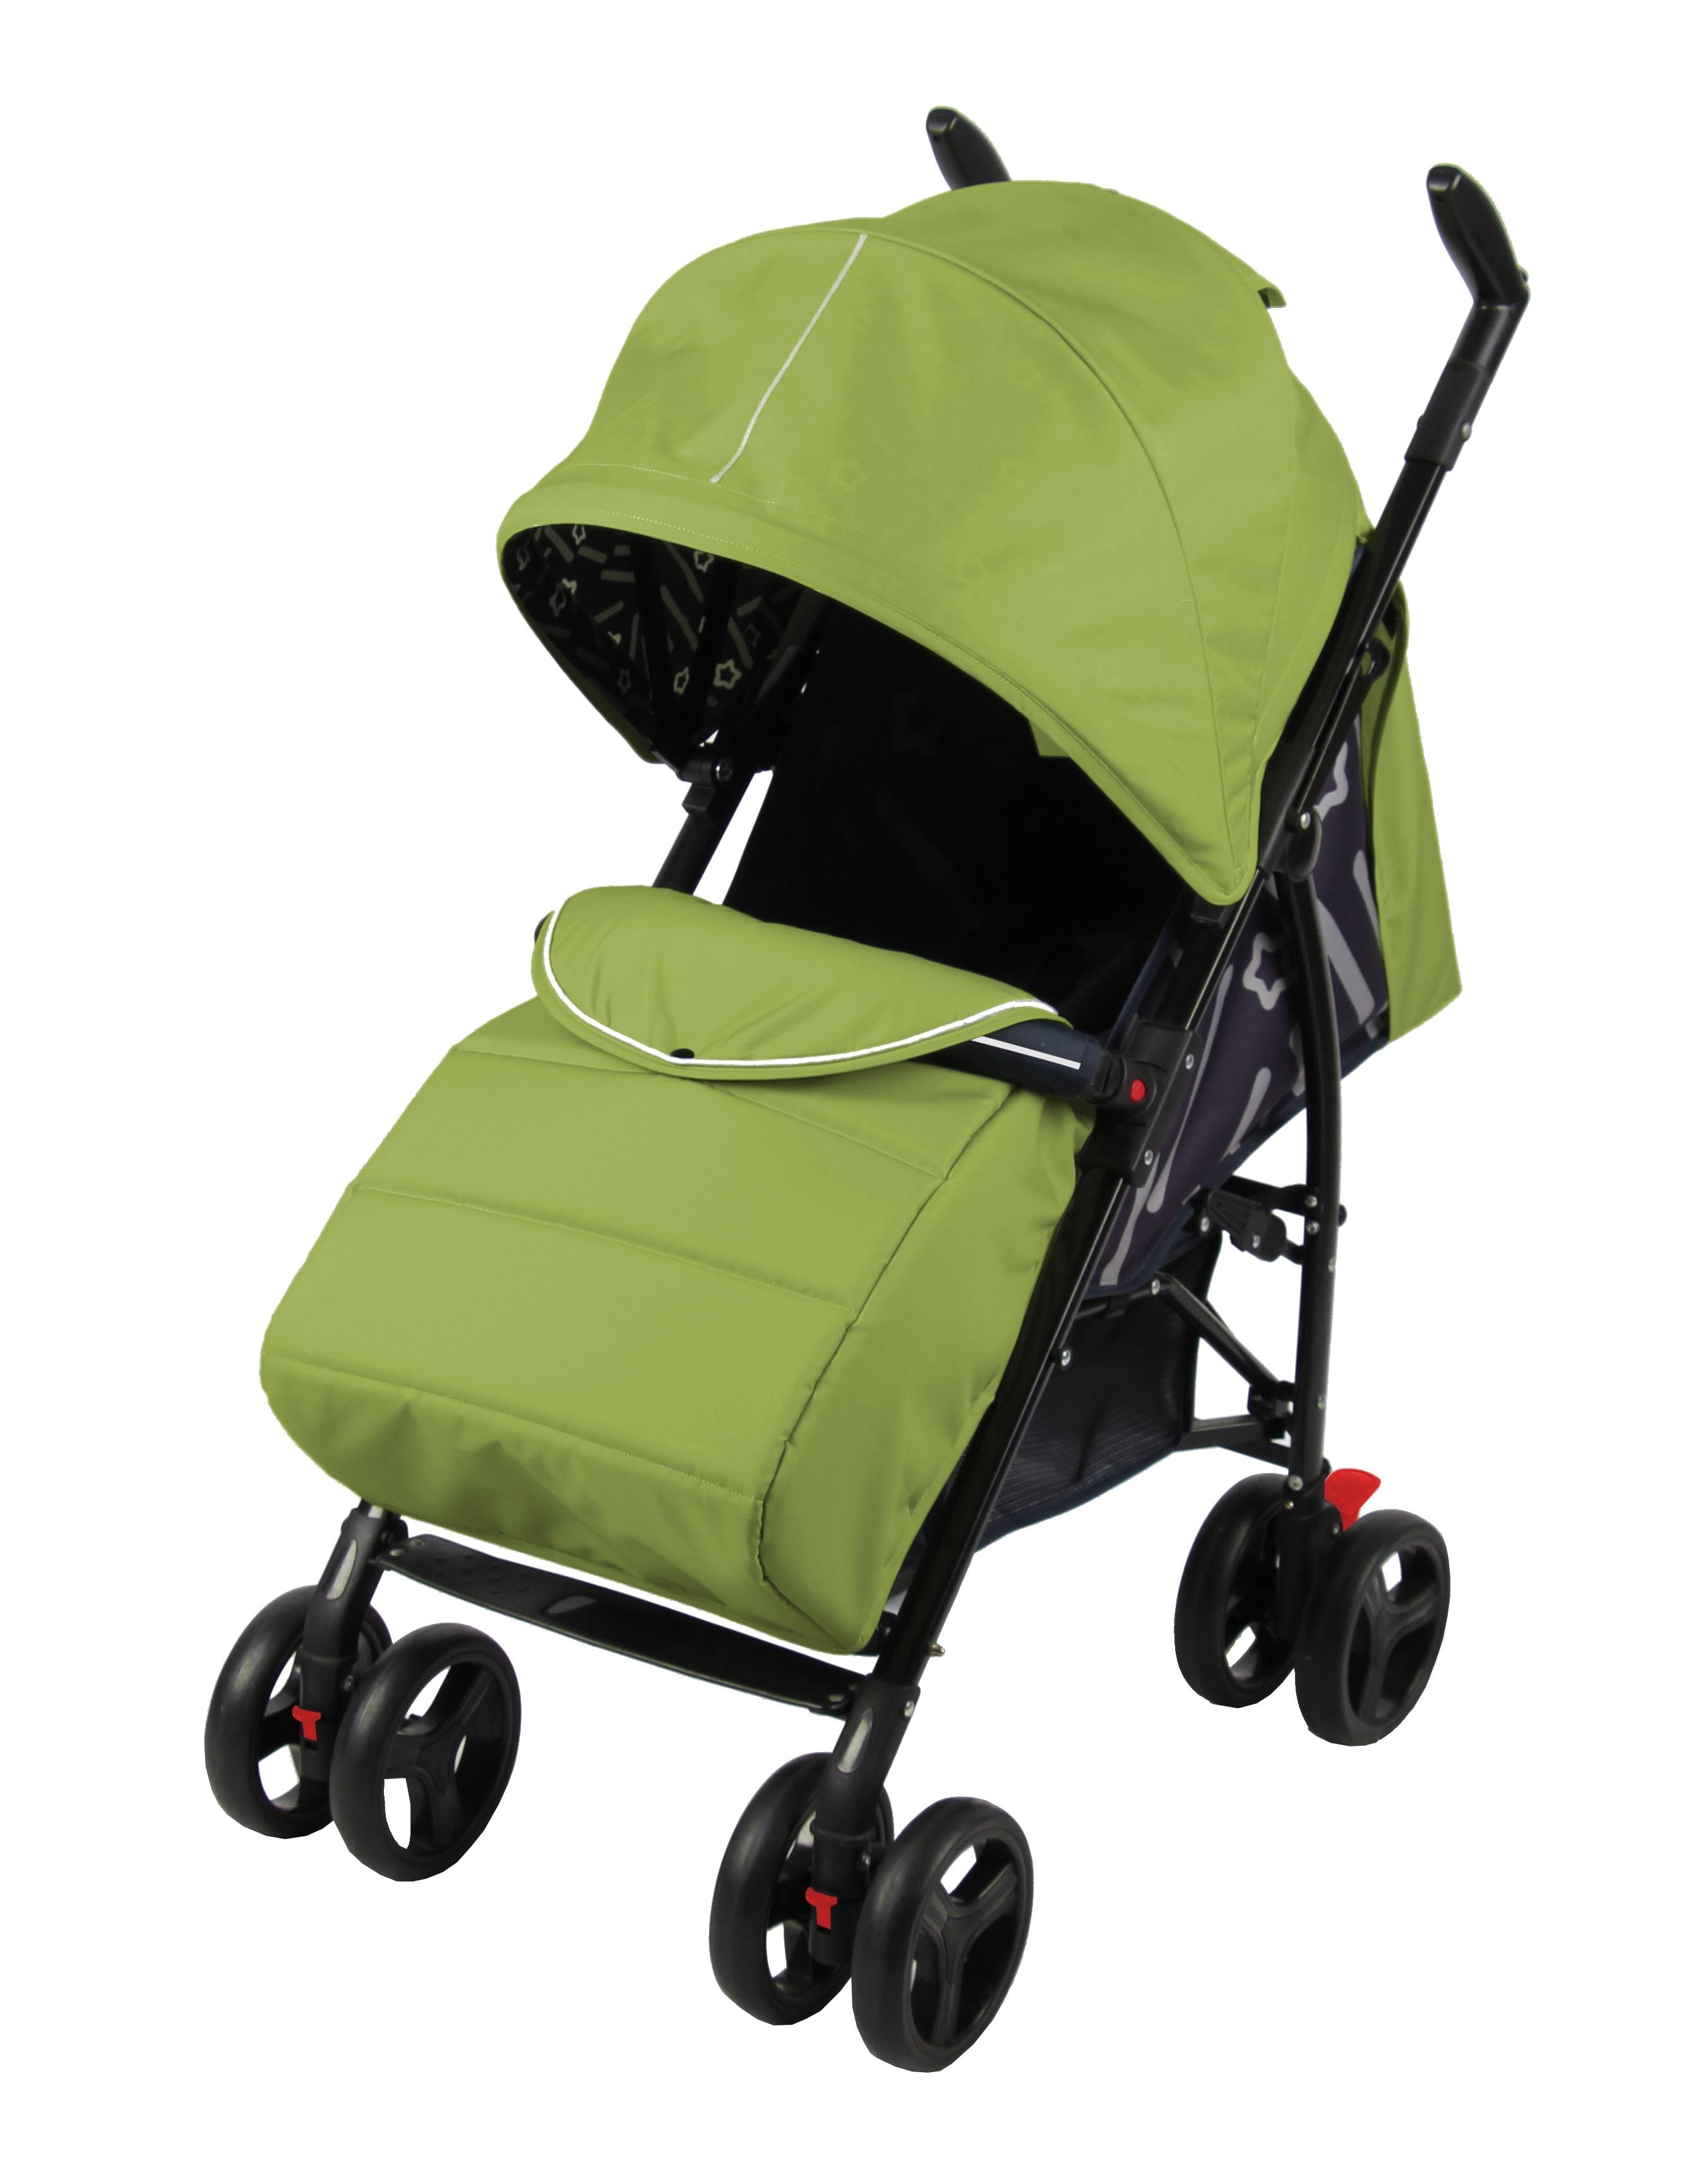 Прогулочная коляска Parusok Walker Pro зеленый